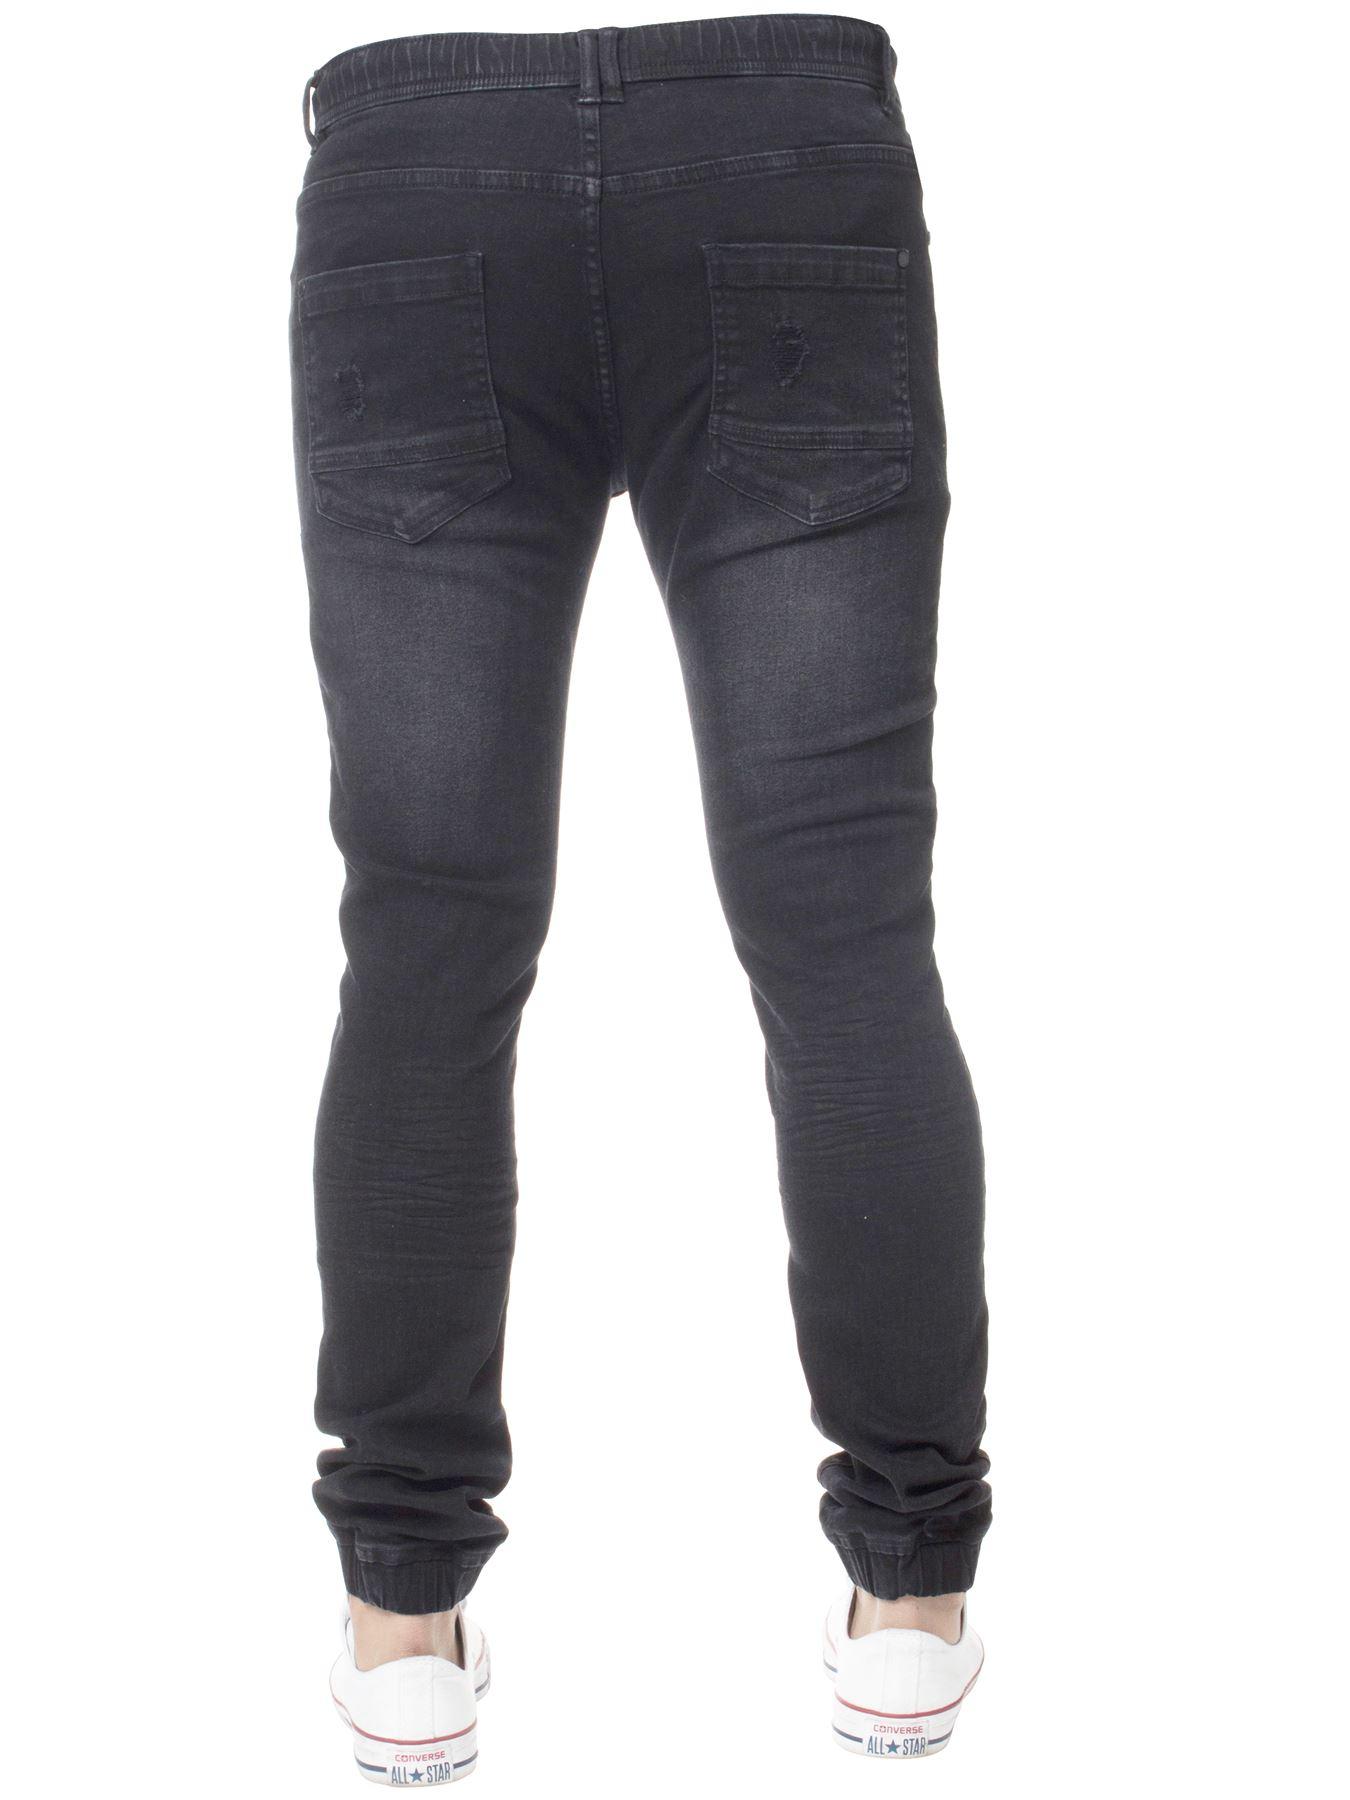 Enzo-Mens-Cuffed-Jeans-Stretch-Fit-Ripped-Denim-Jogger-Pants-Big-Tall-All-Waists thumbnail 6